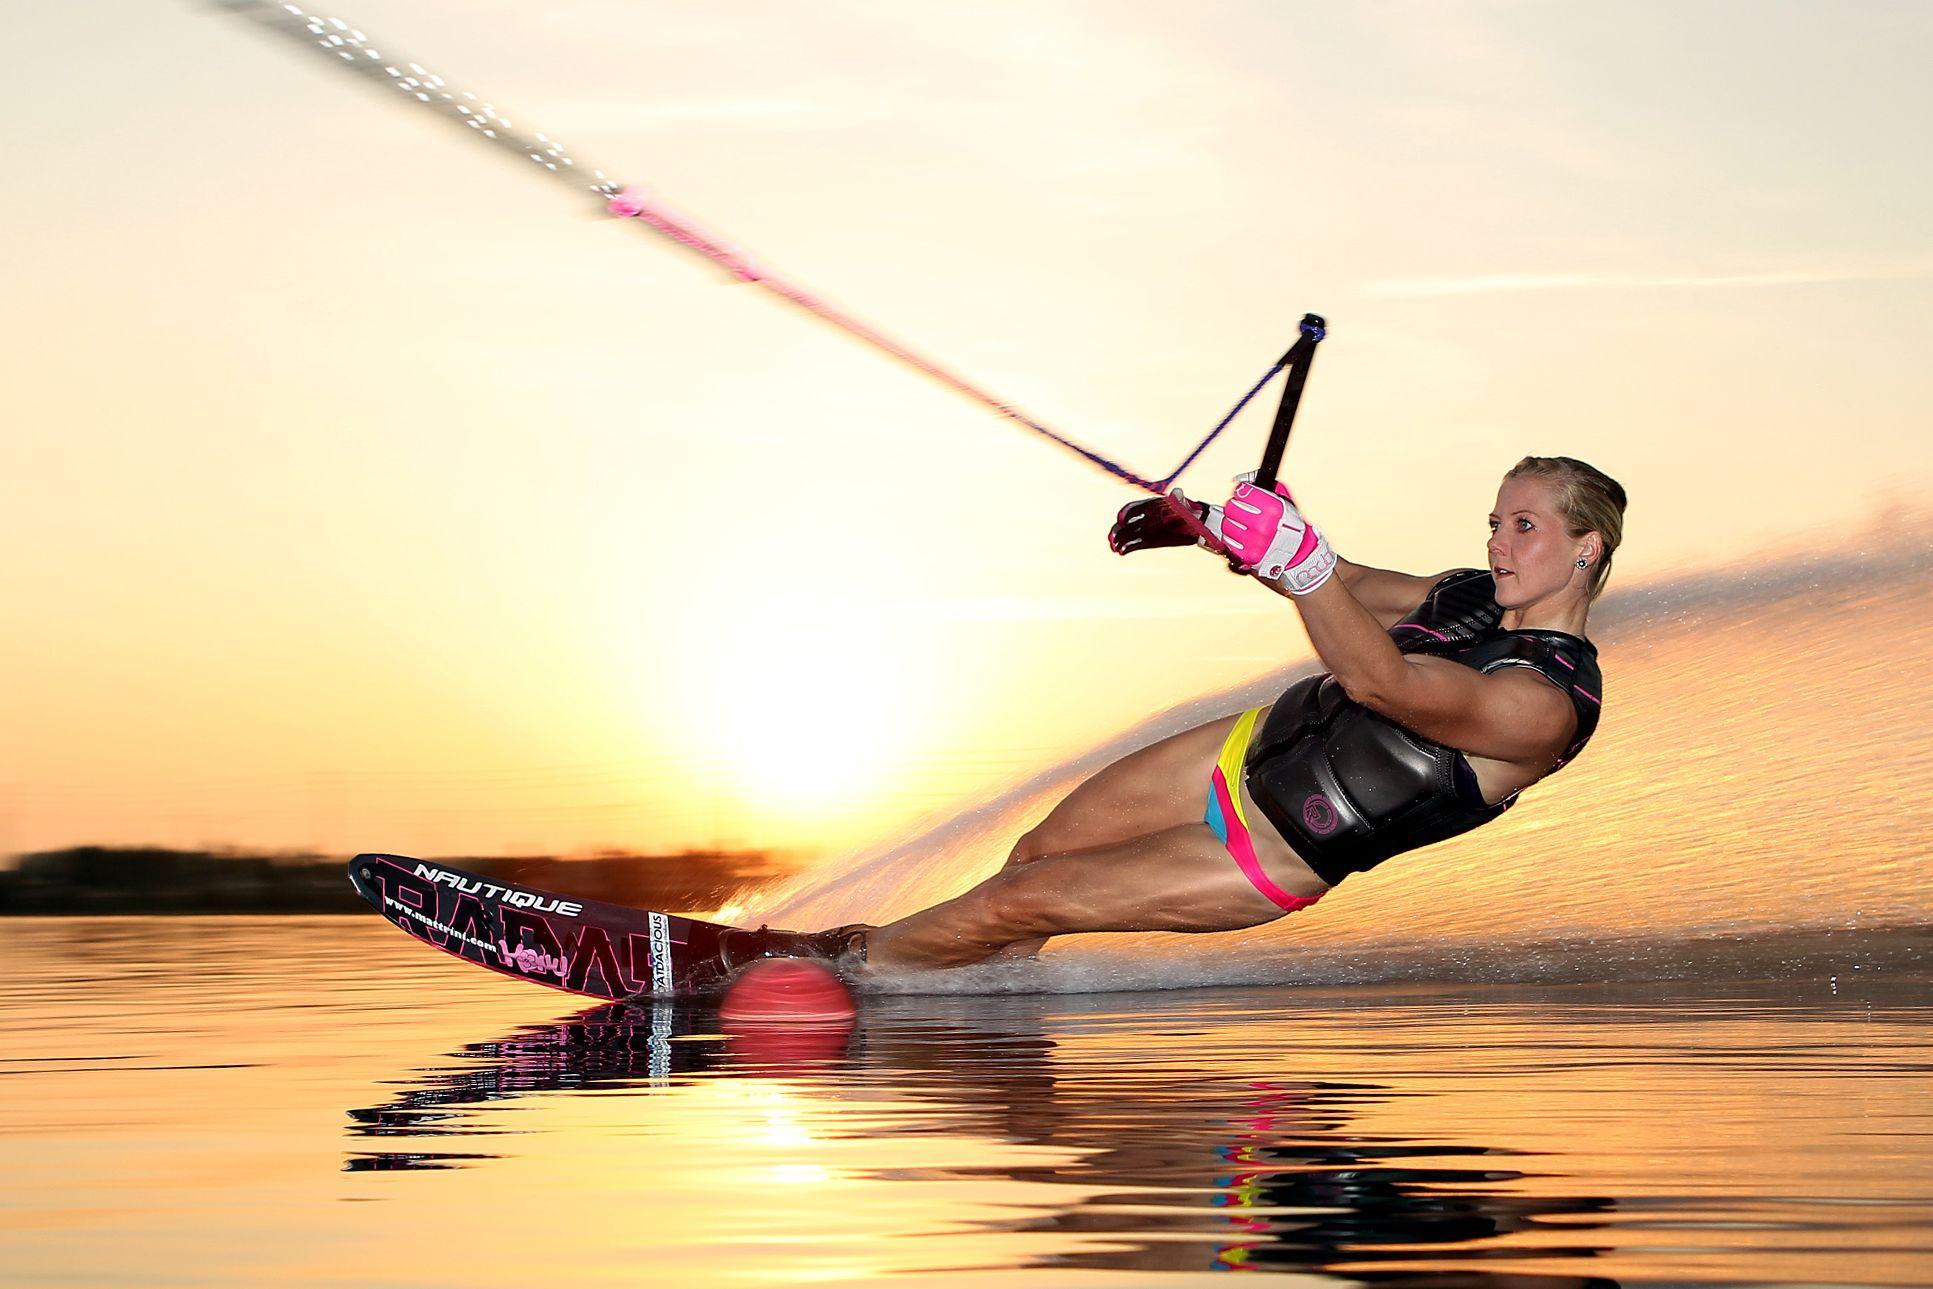 Whitney Mcclintock C Thomas Gustafson C78g1578 Jpg 1 933 1 289 Pixels Water Skiing Slalom Water Skiing Surfing